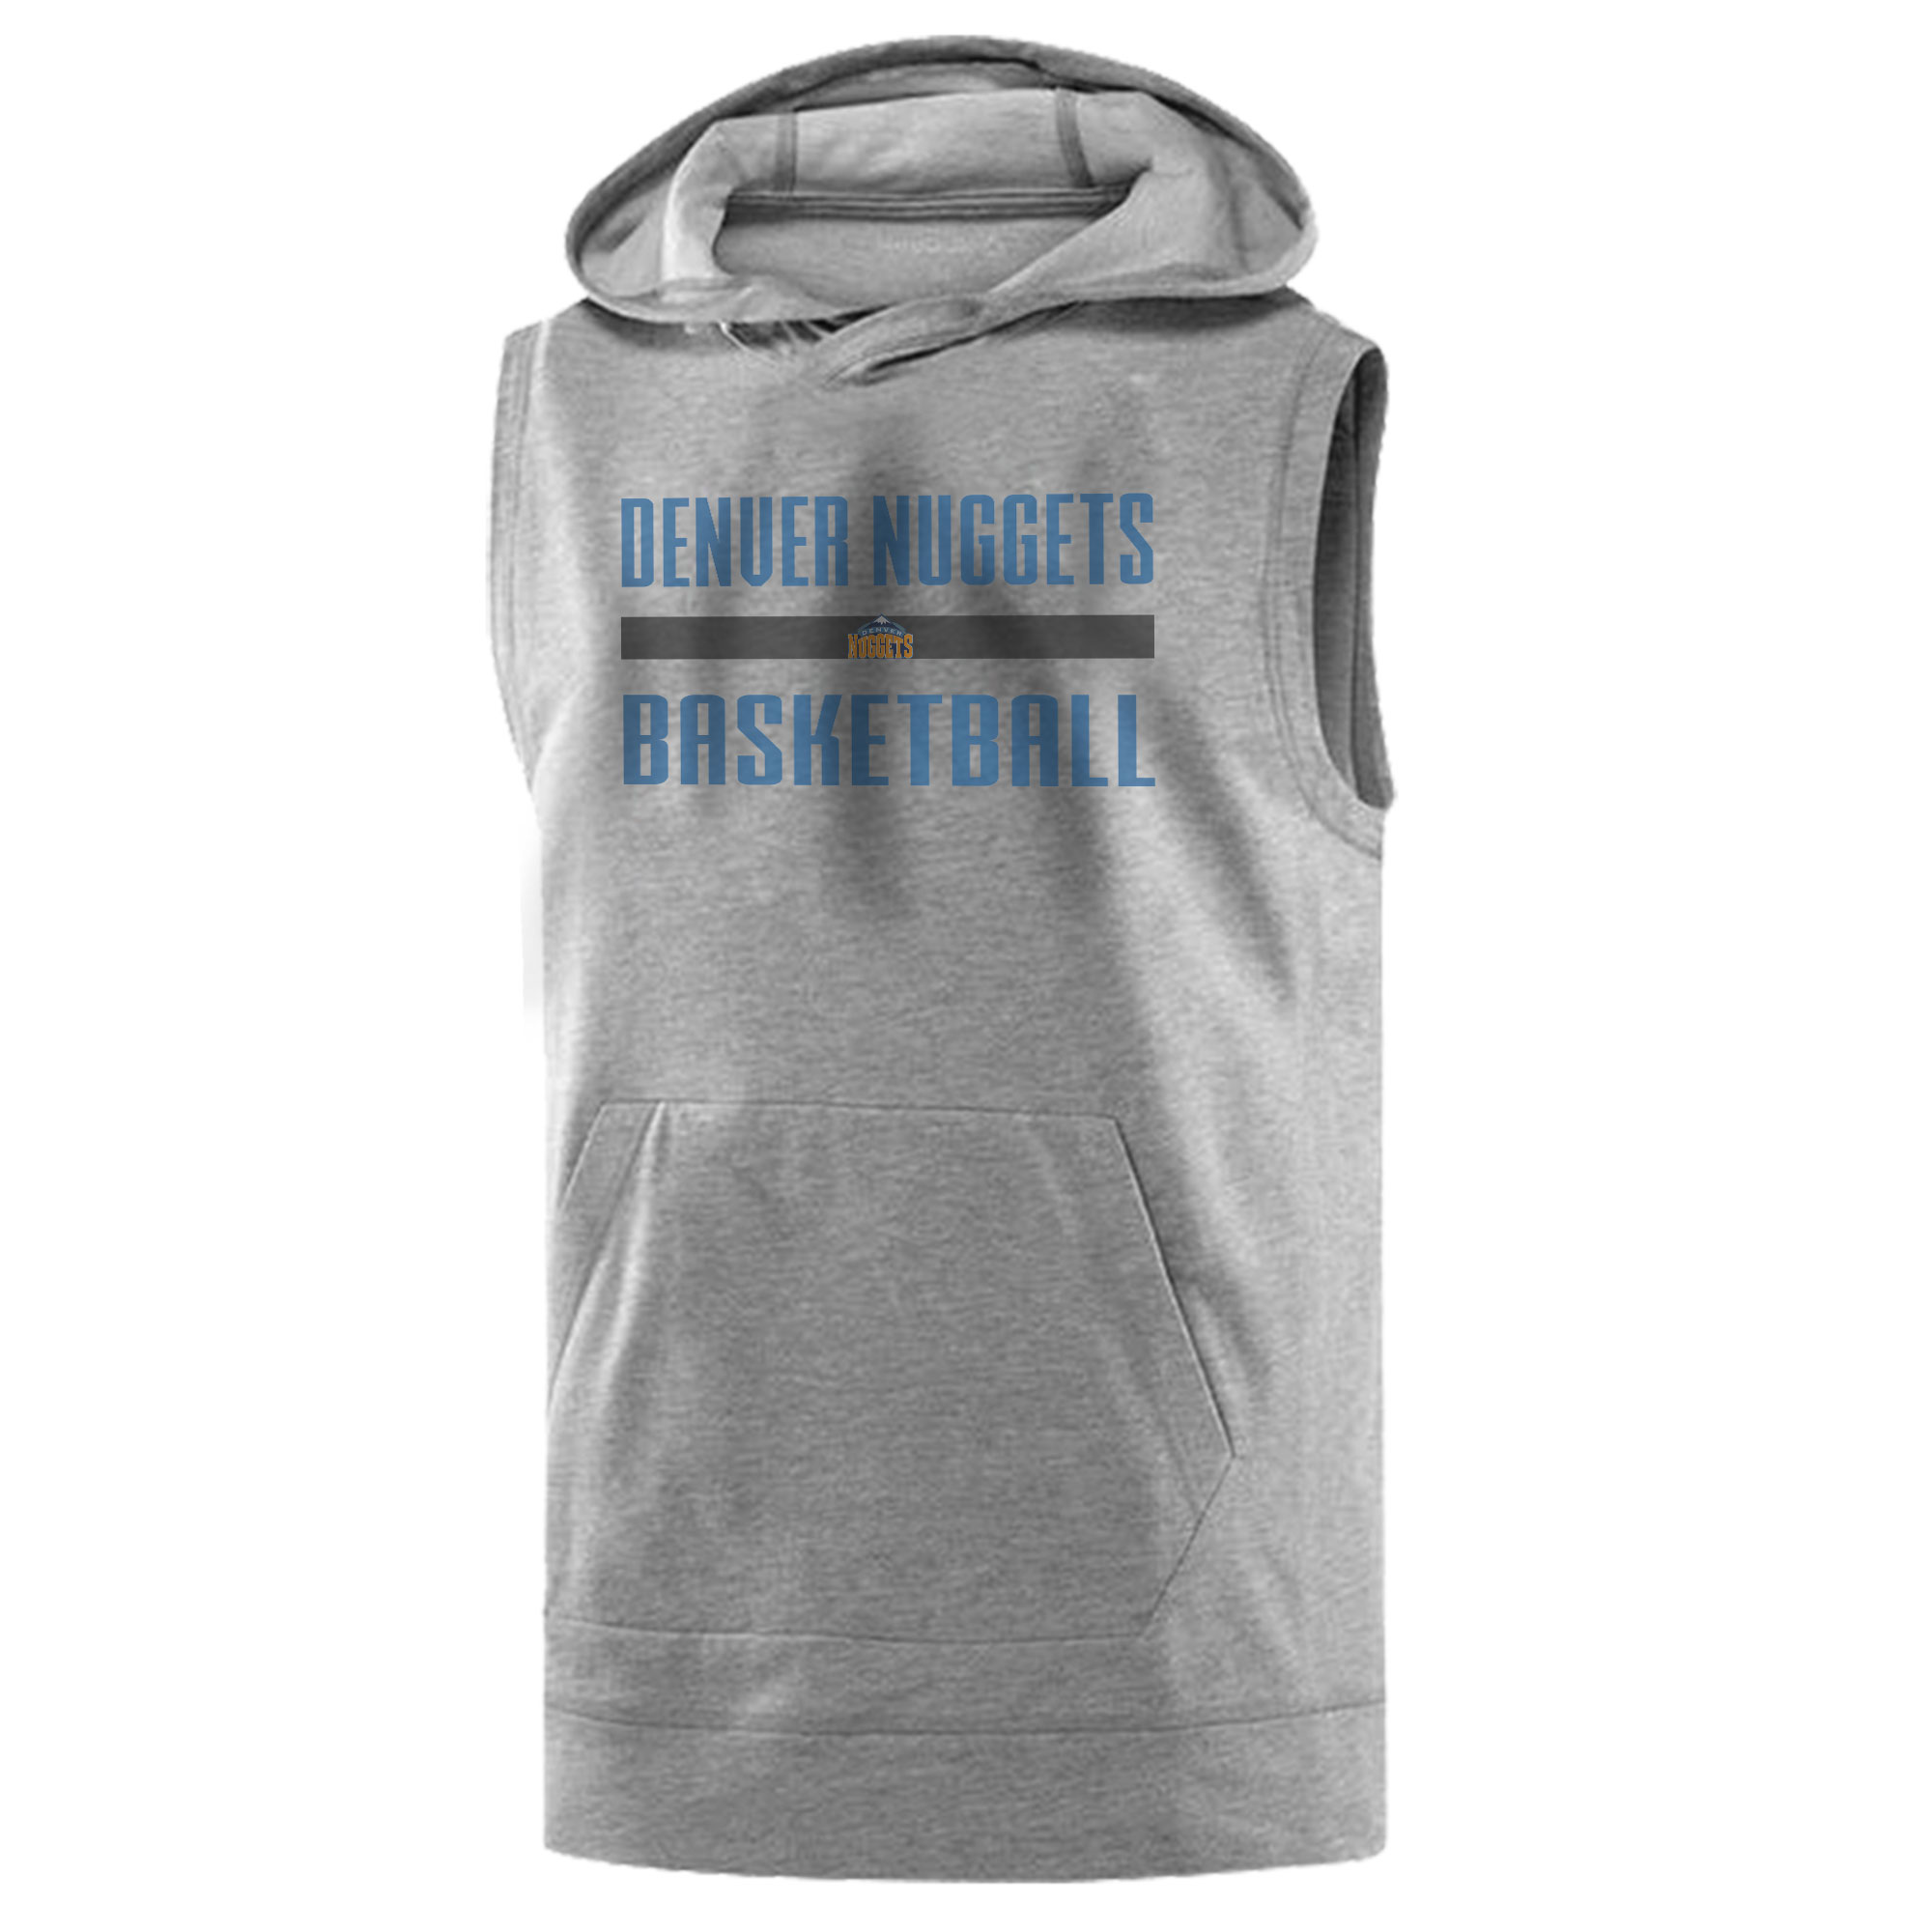 Denver Basketball Sleeveless (KLS-GRY-NP-nuggets.bsktbll-509)